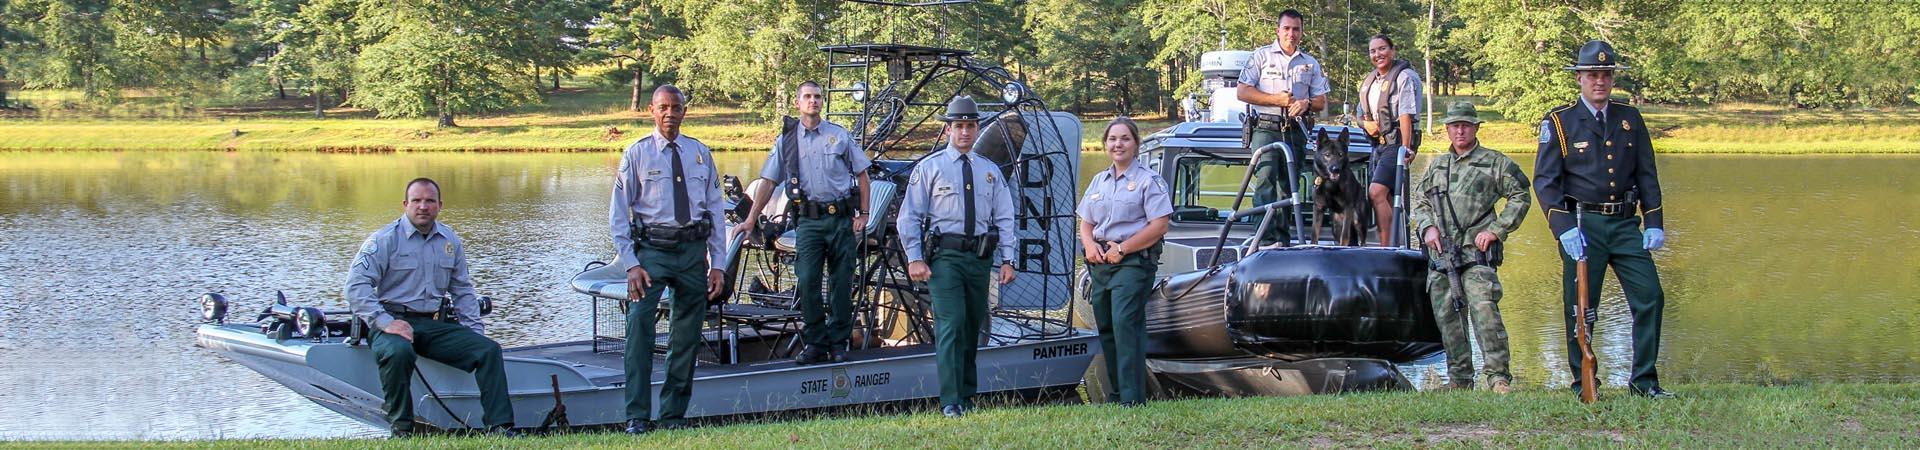 Law Enforcement Rangers, various specialties